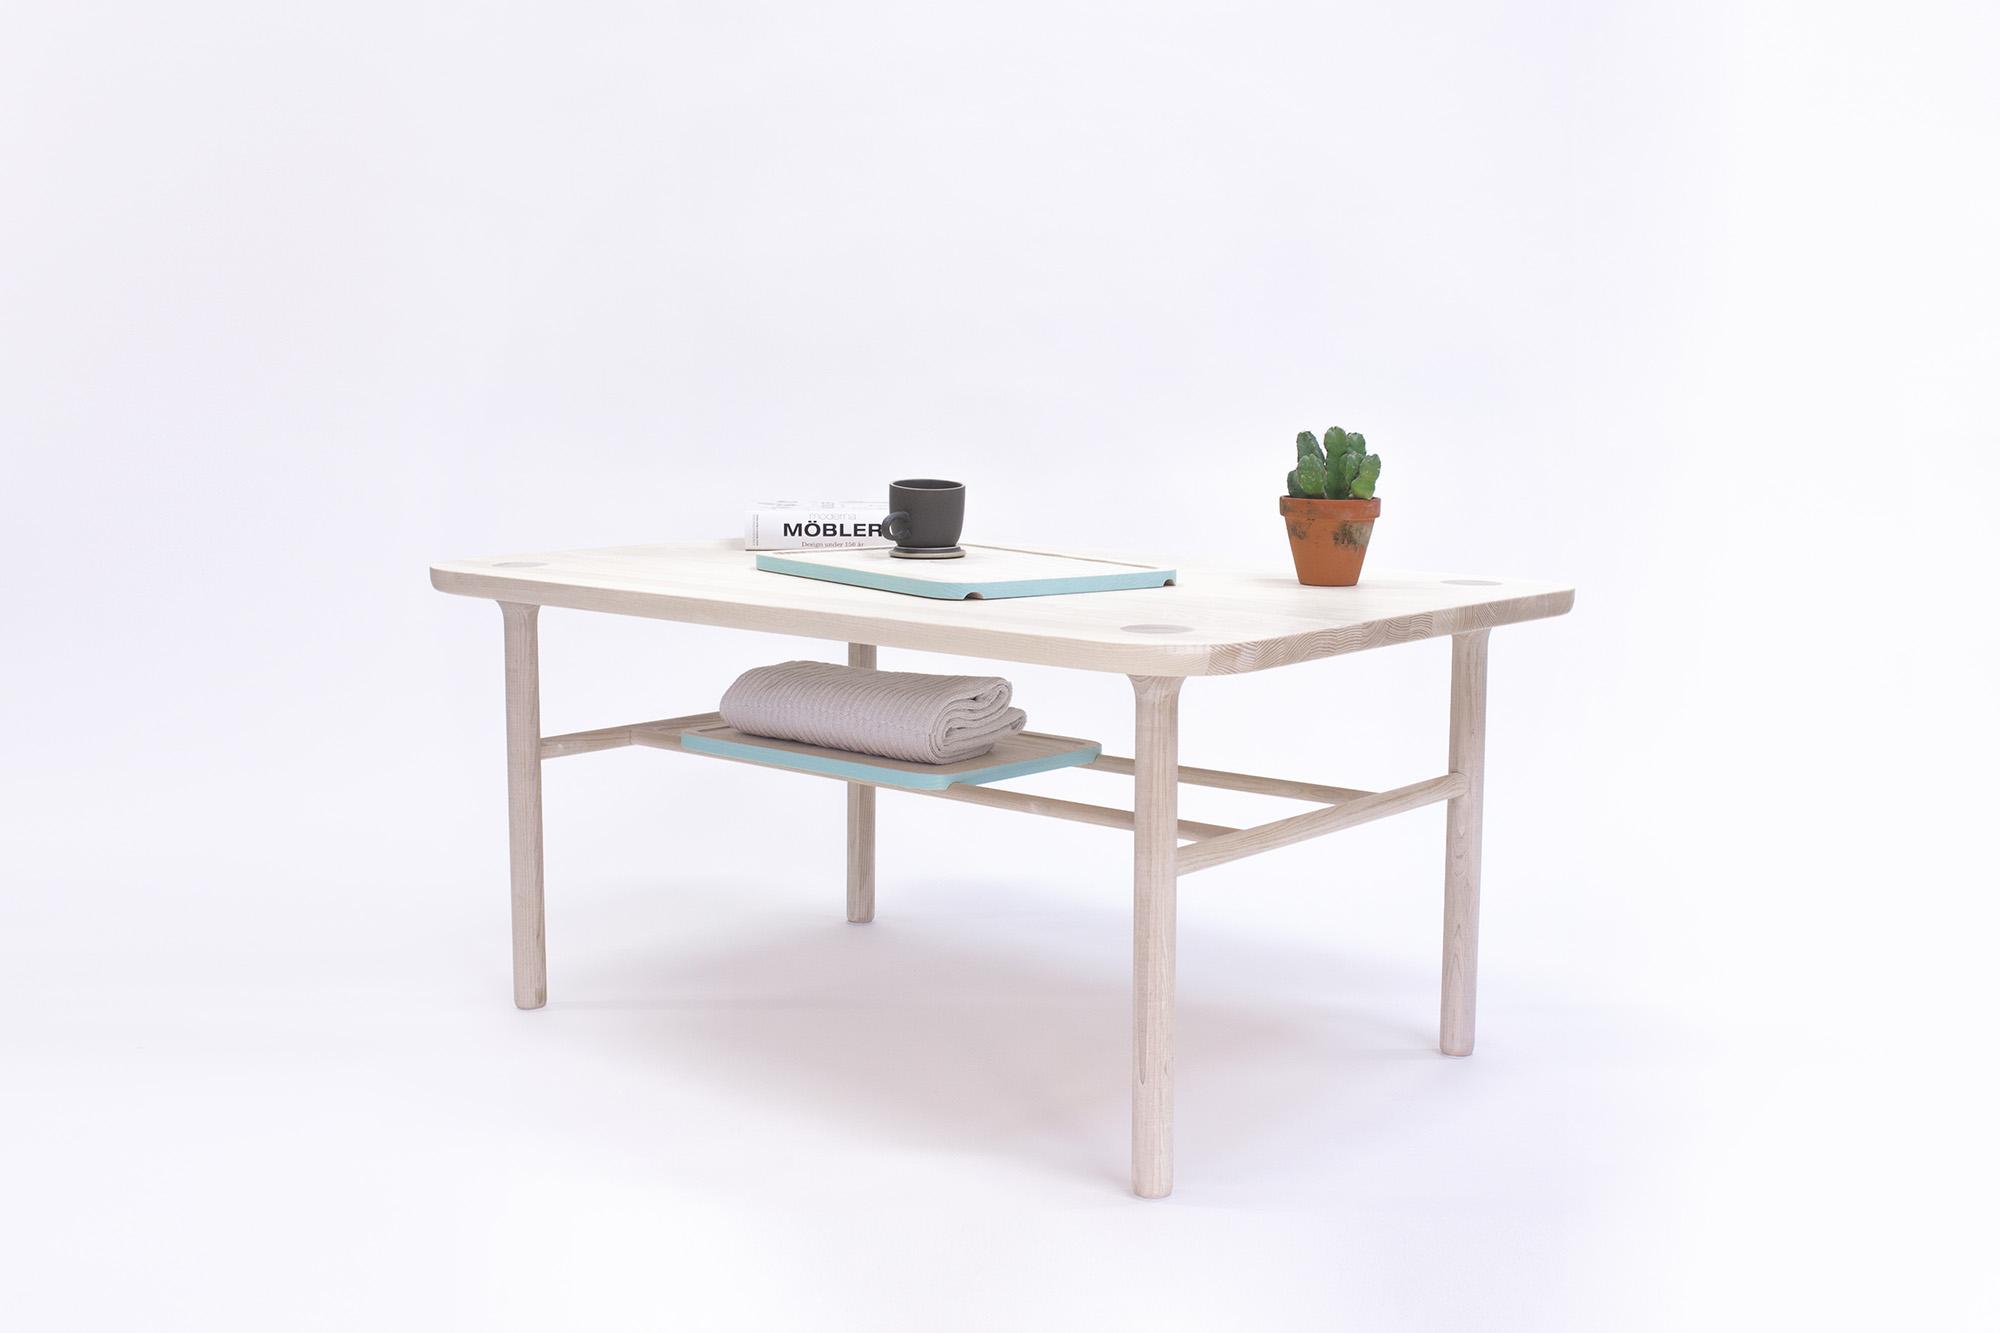 . Minimal Scandinavian Furniture By Designer Carlos Jim nez